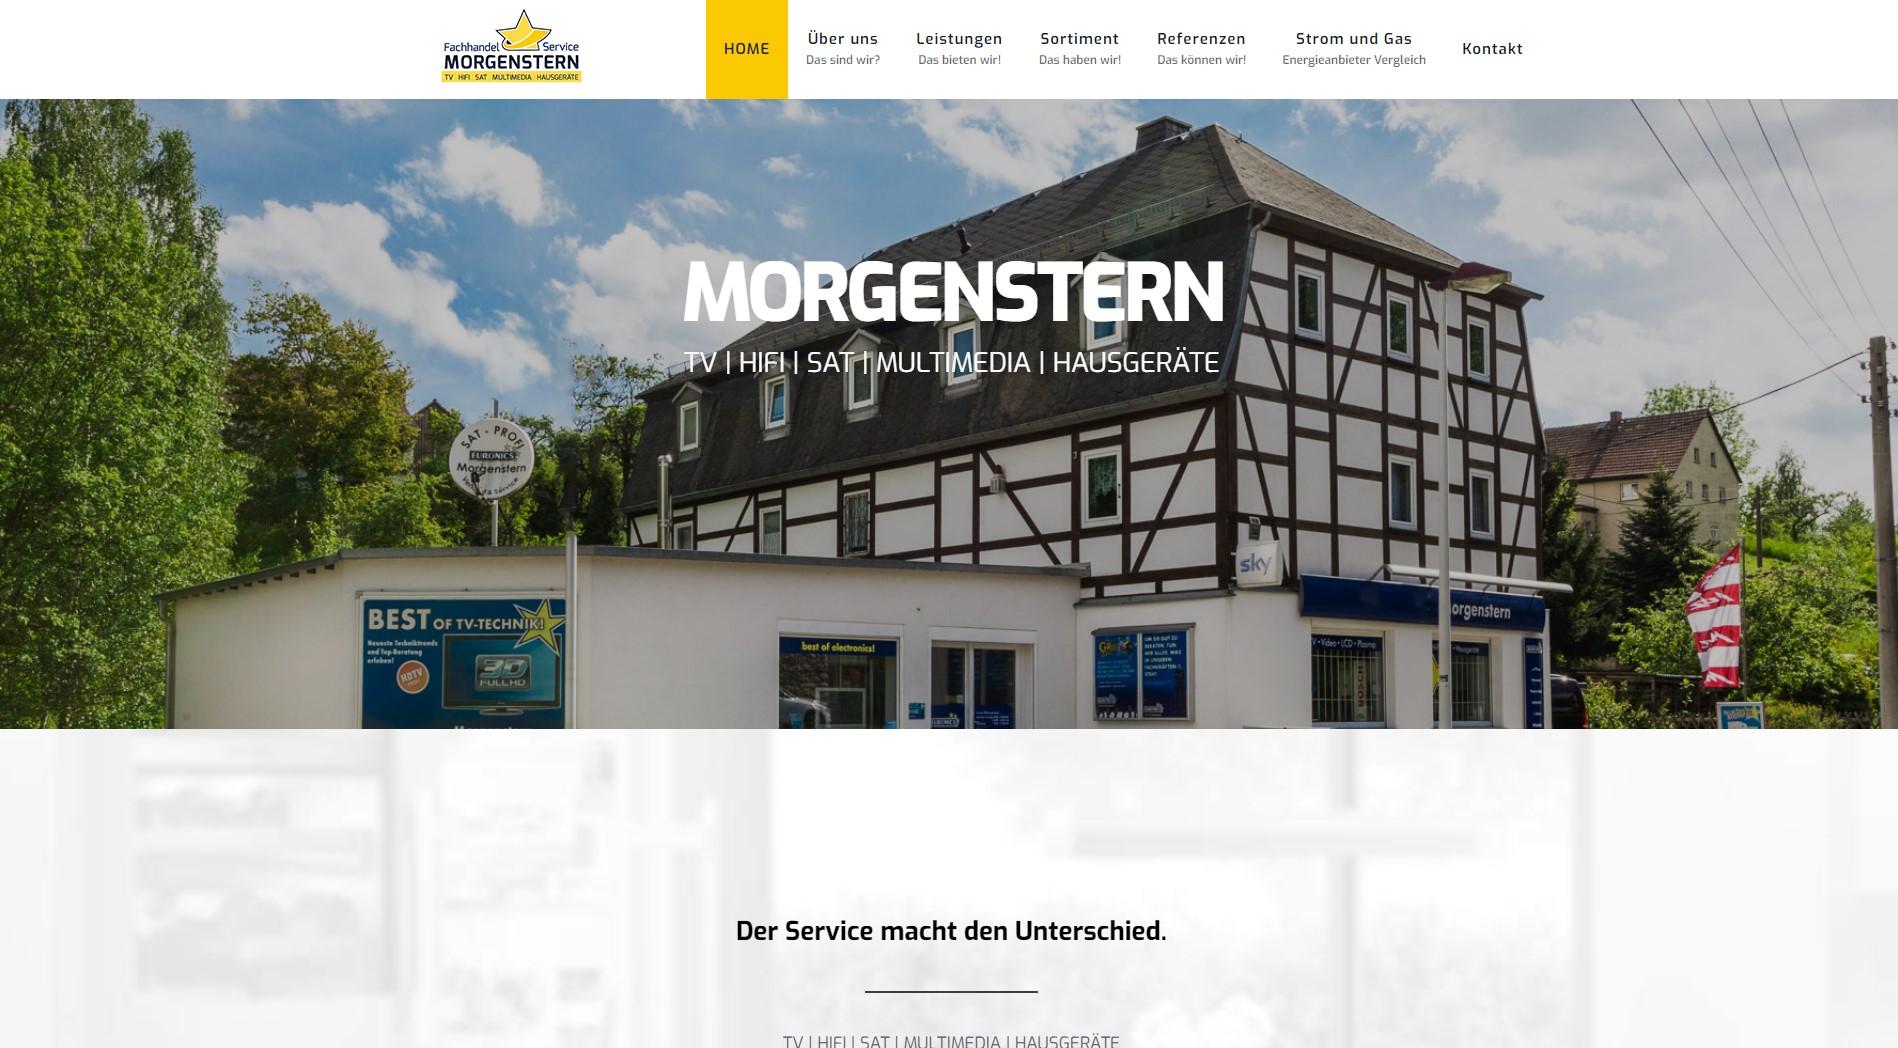 Webseite www.morgenstern-mohorn.de